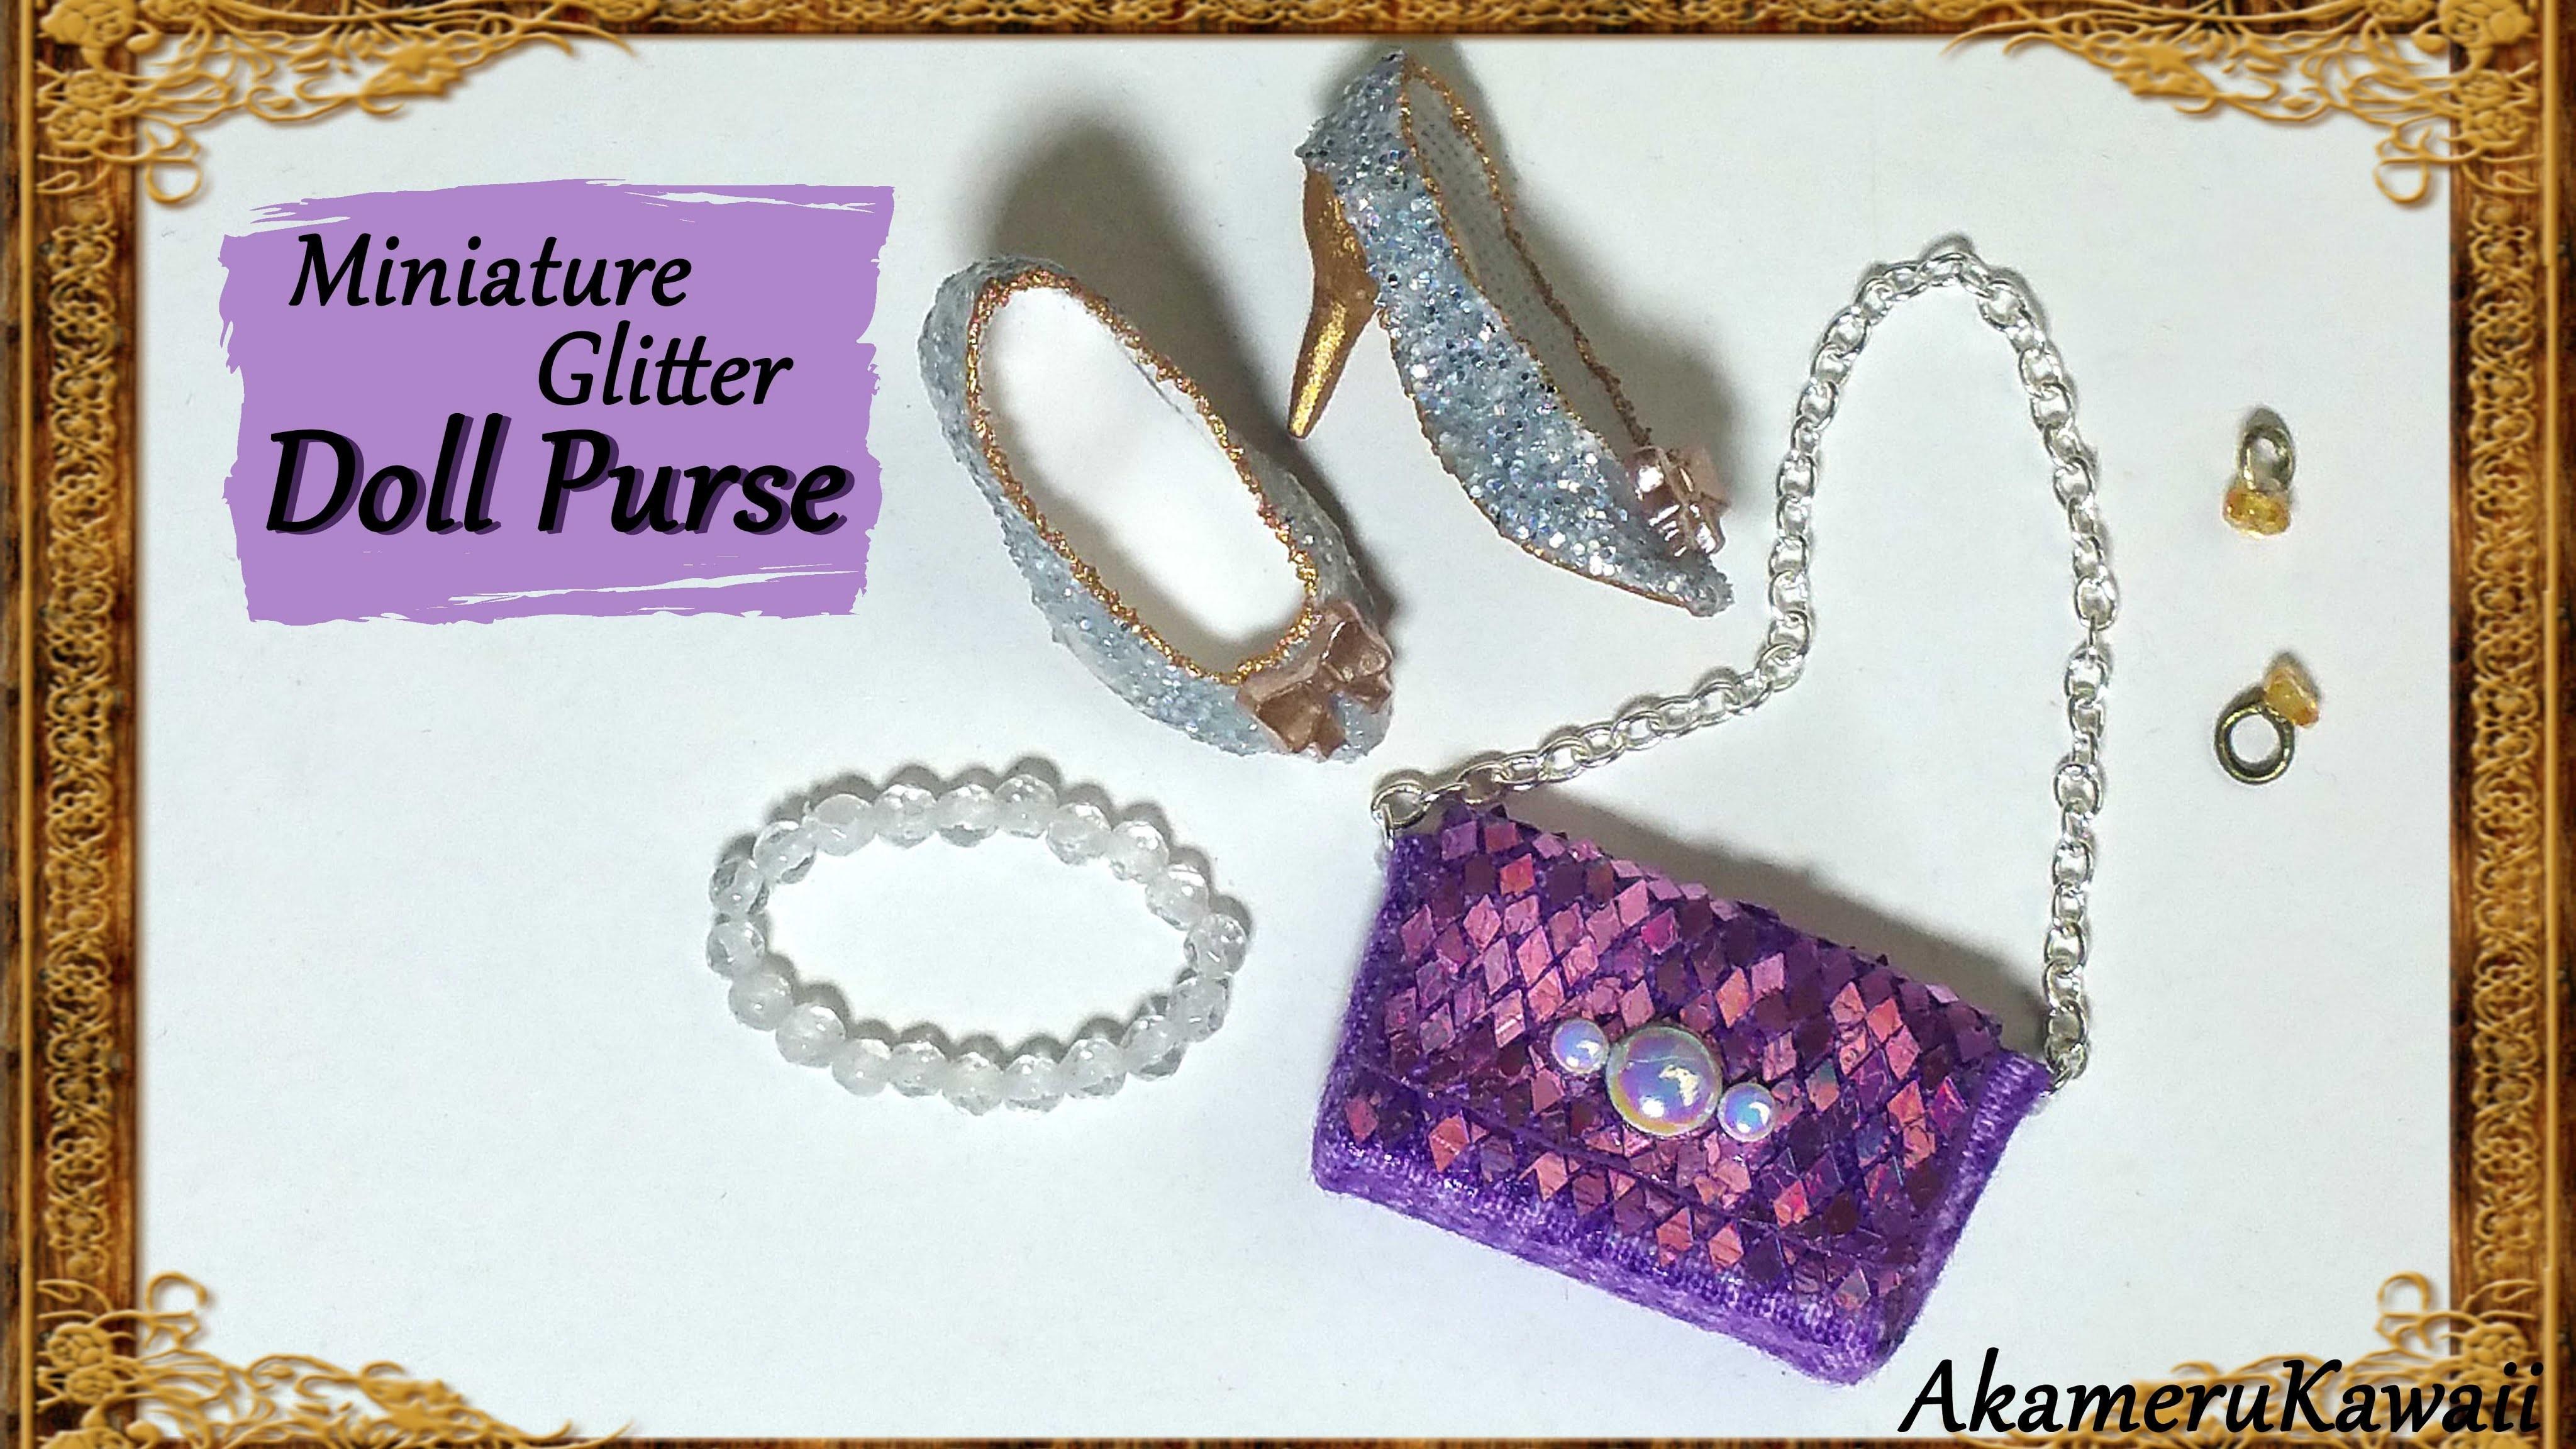 Sparkly Miniature Glitter Purse.handbag - Fabric Tutorial